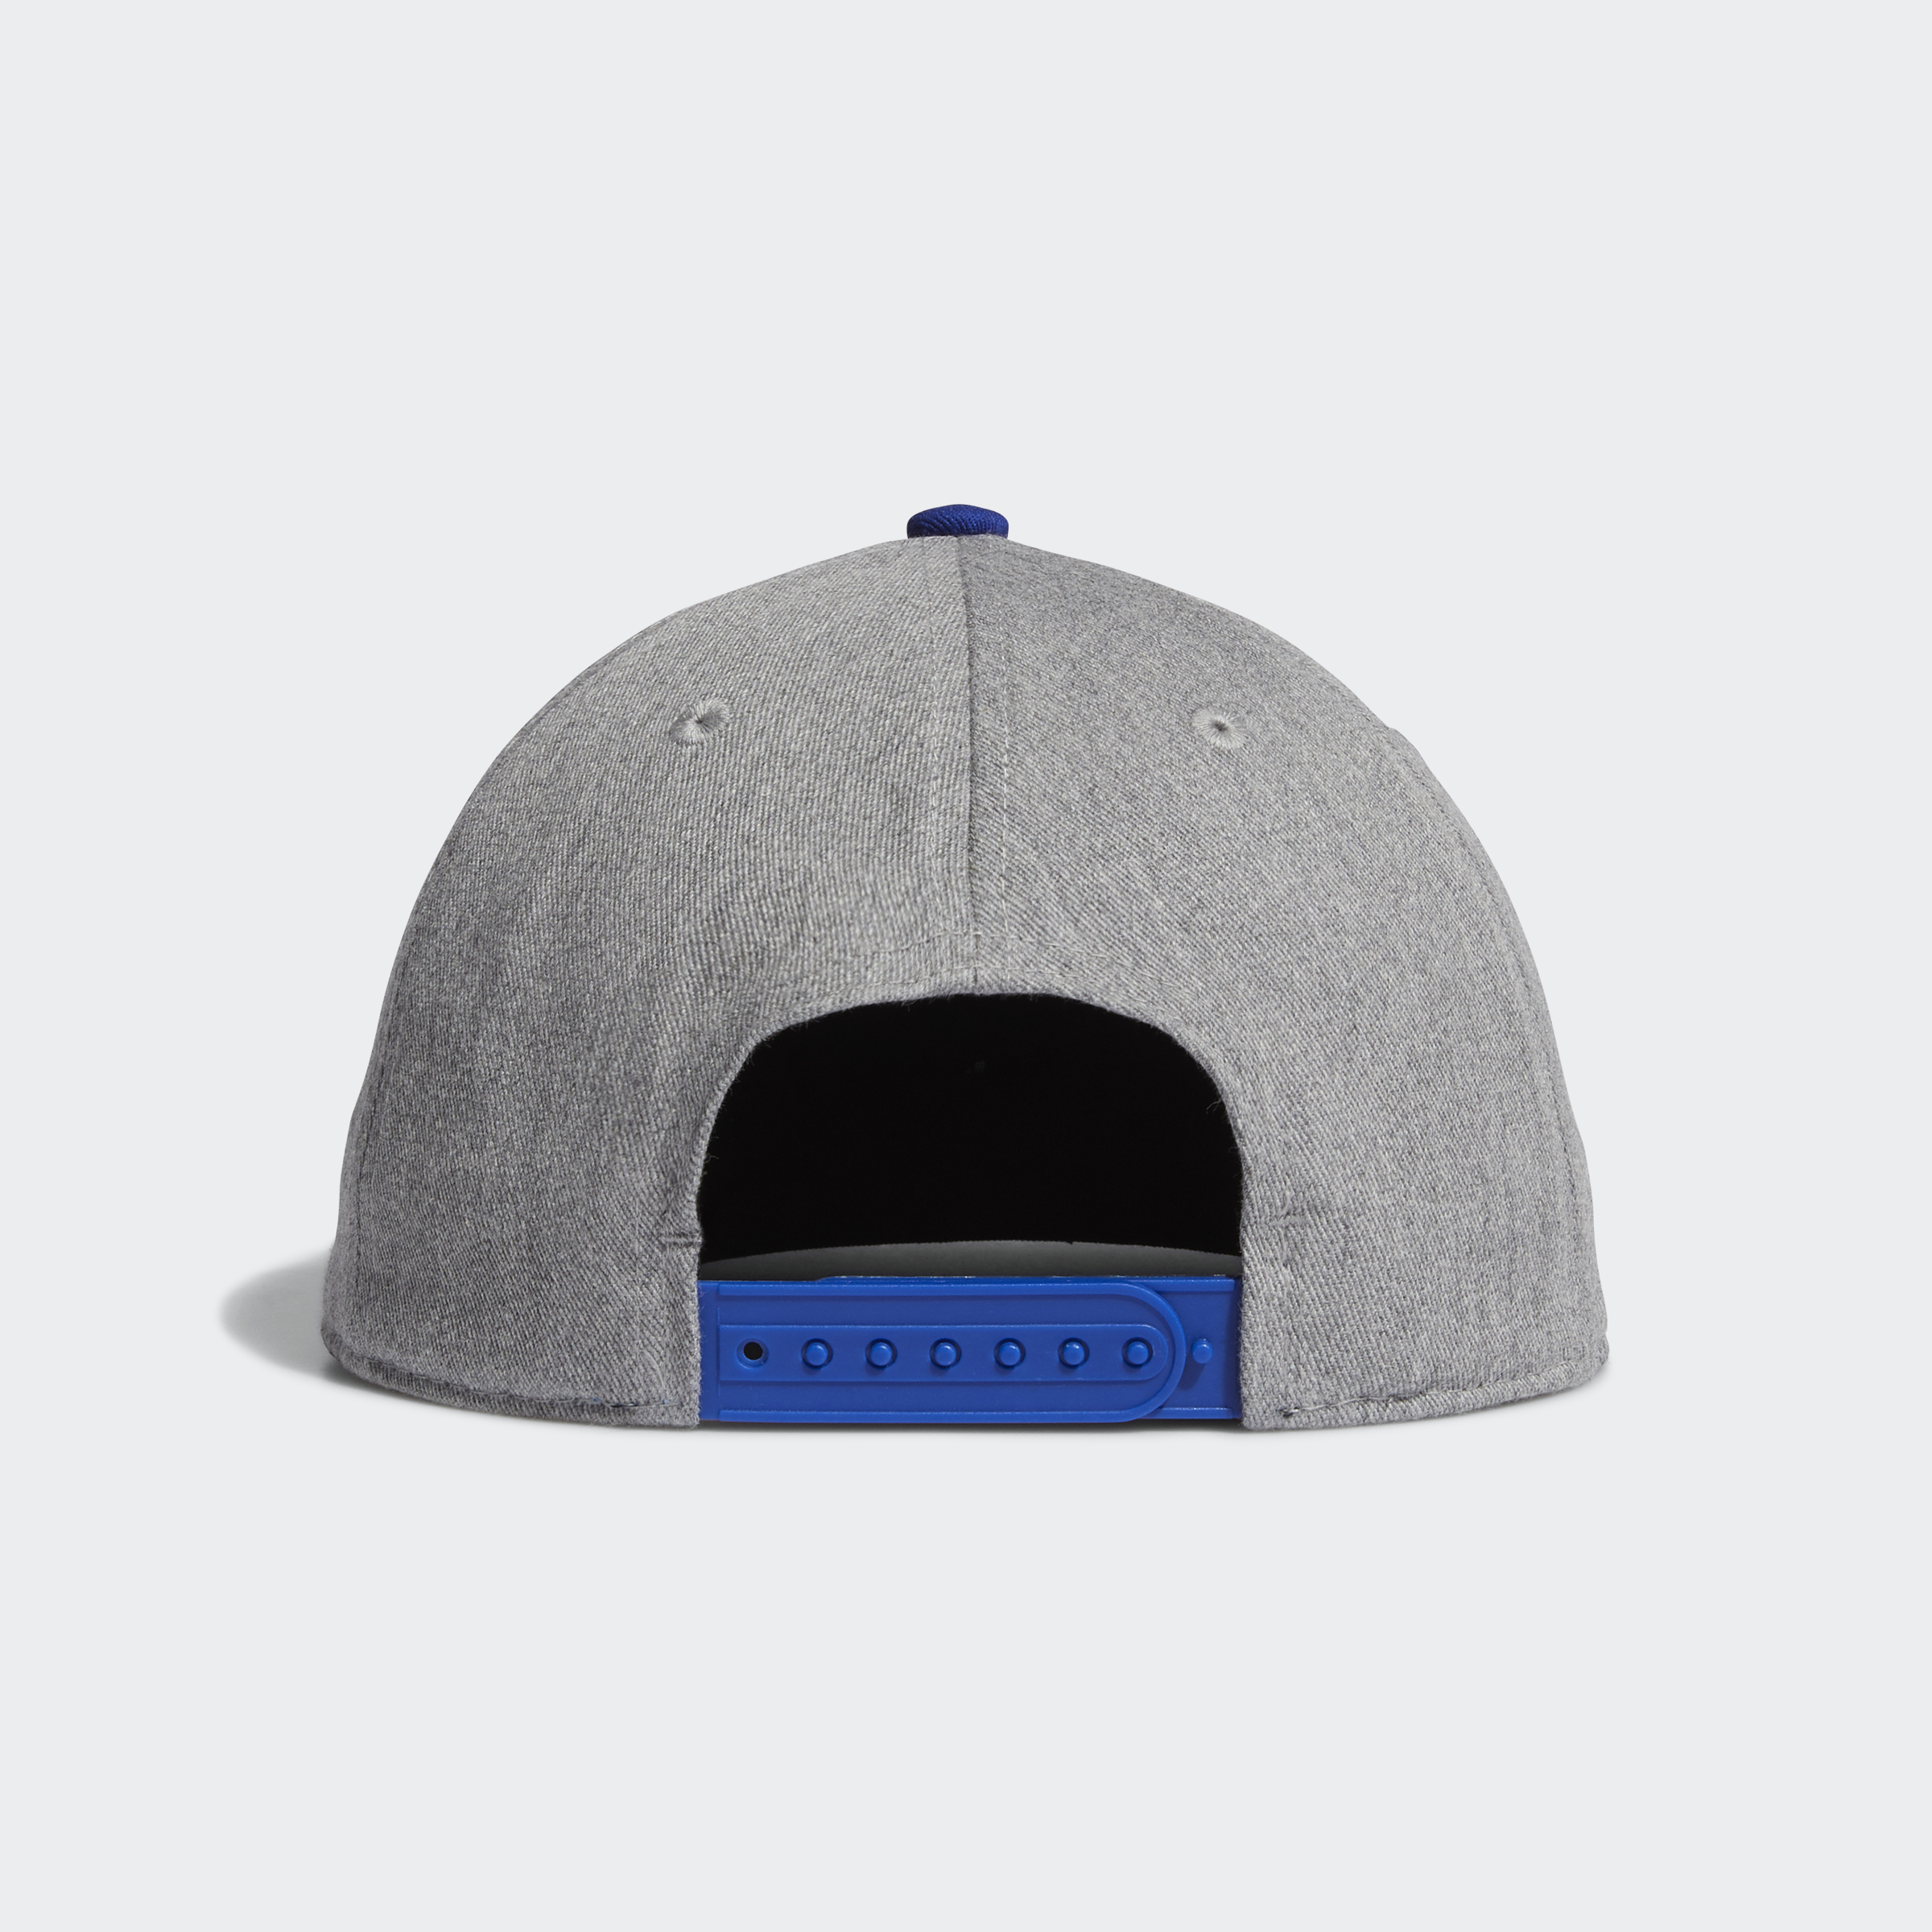 adidas-Vancouver-Canucks-Three-Stripe-Hockey-Snapback-Cap-Men-039-s-Hats thumbnail 11